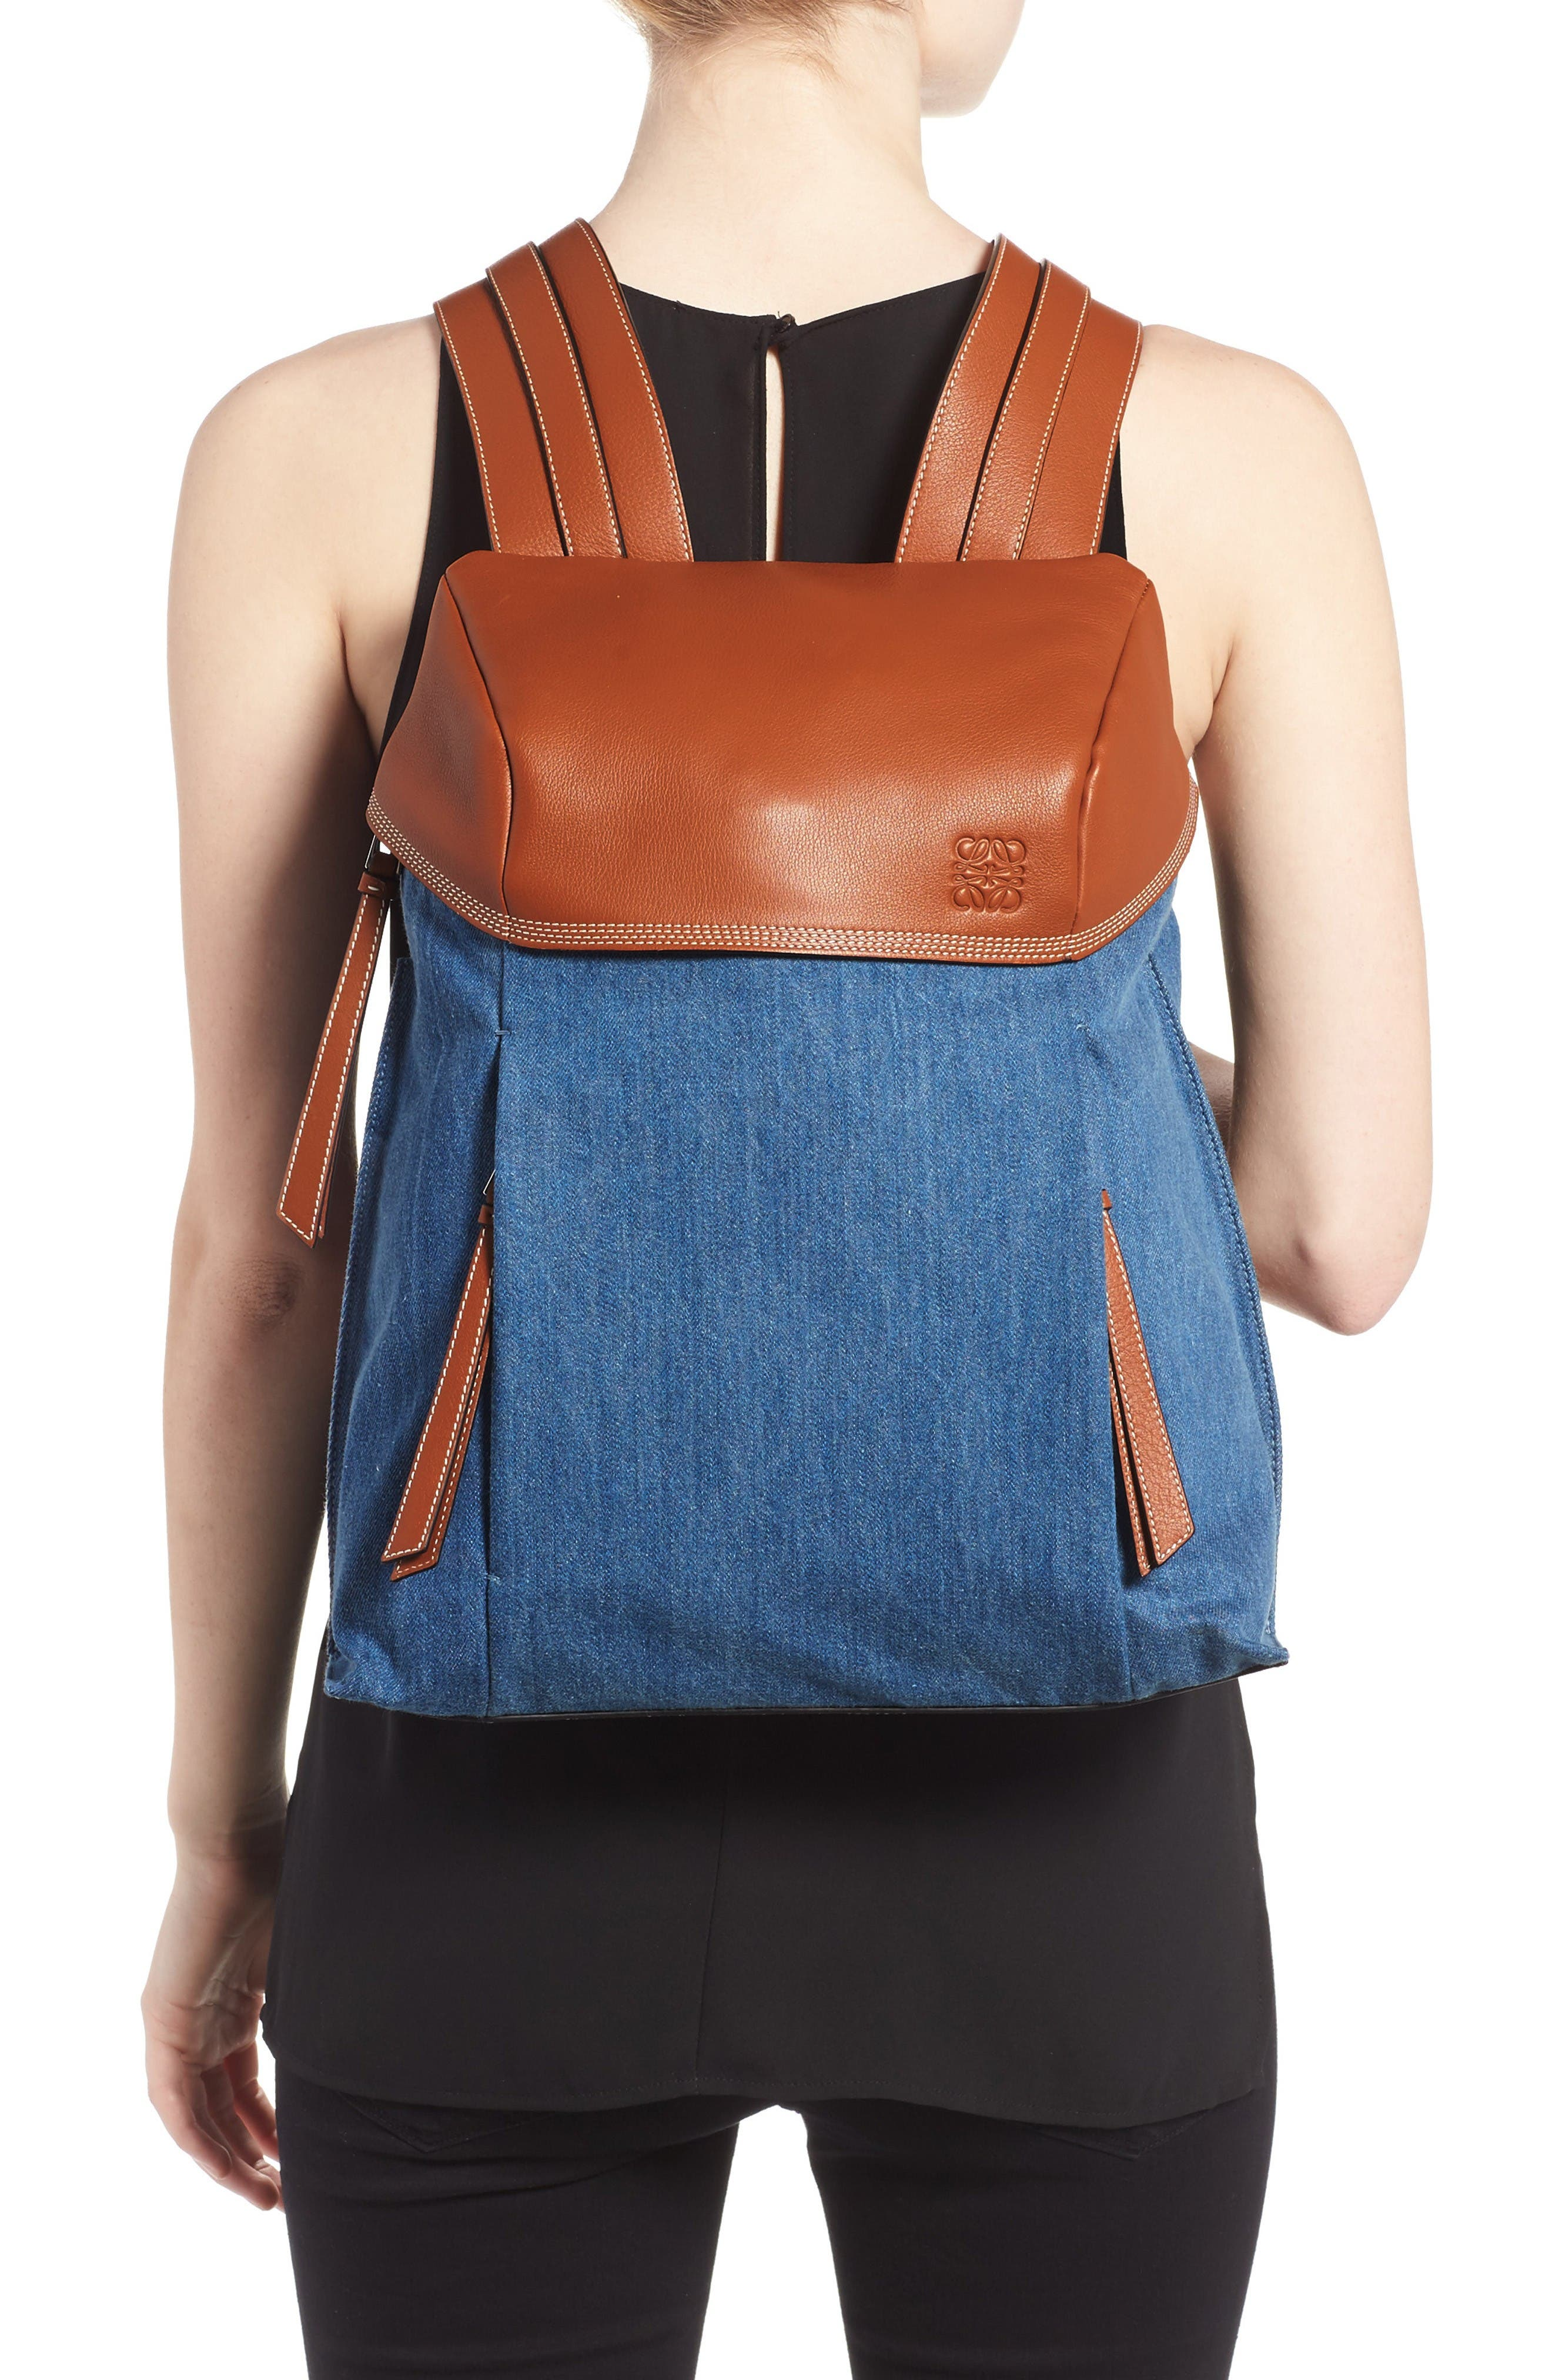 T Small Denim & Leather Backpack,                             Alternate thumbnail 2, color,                             Dark Blue/Tan